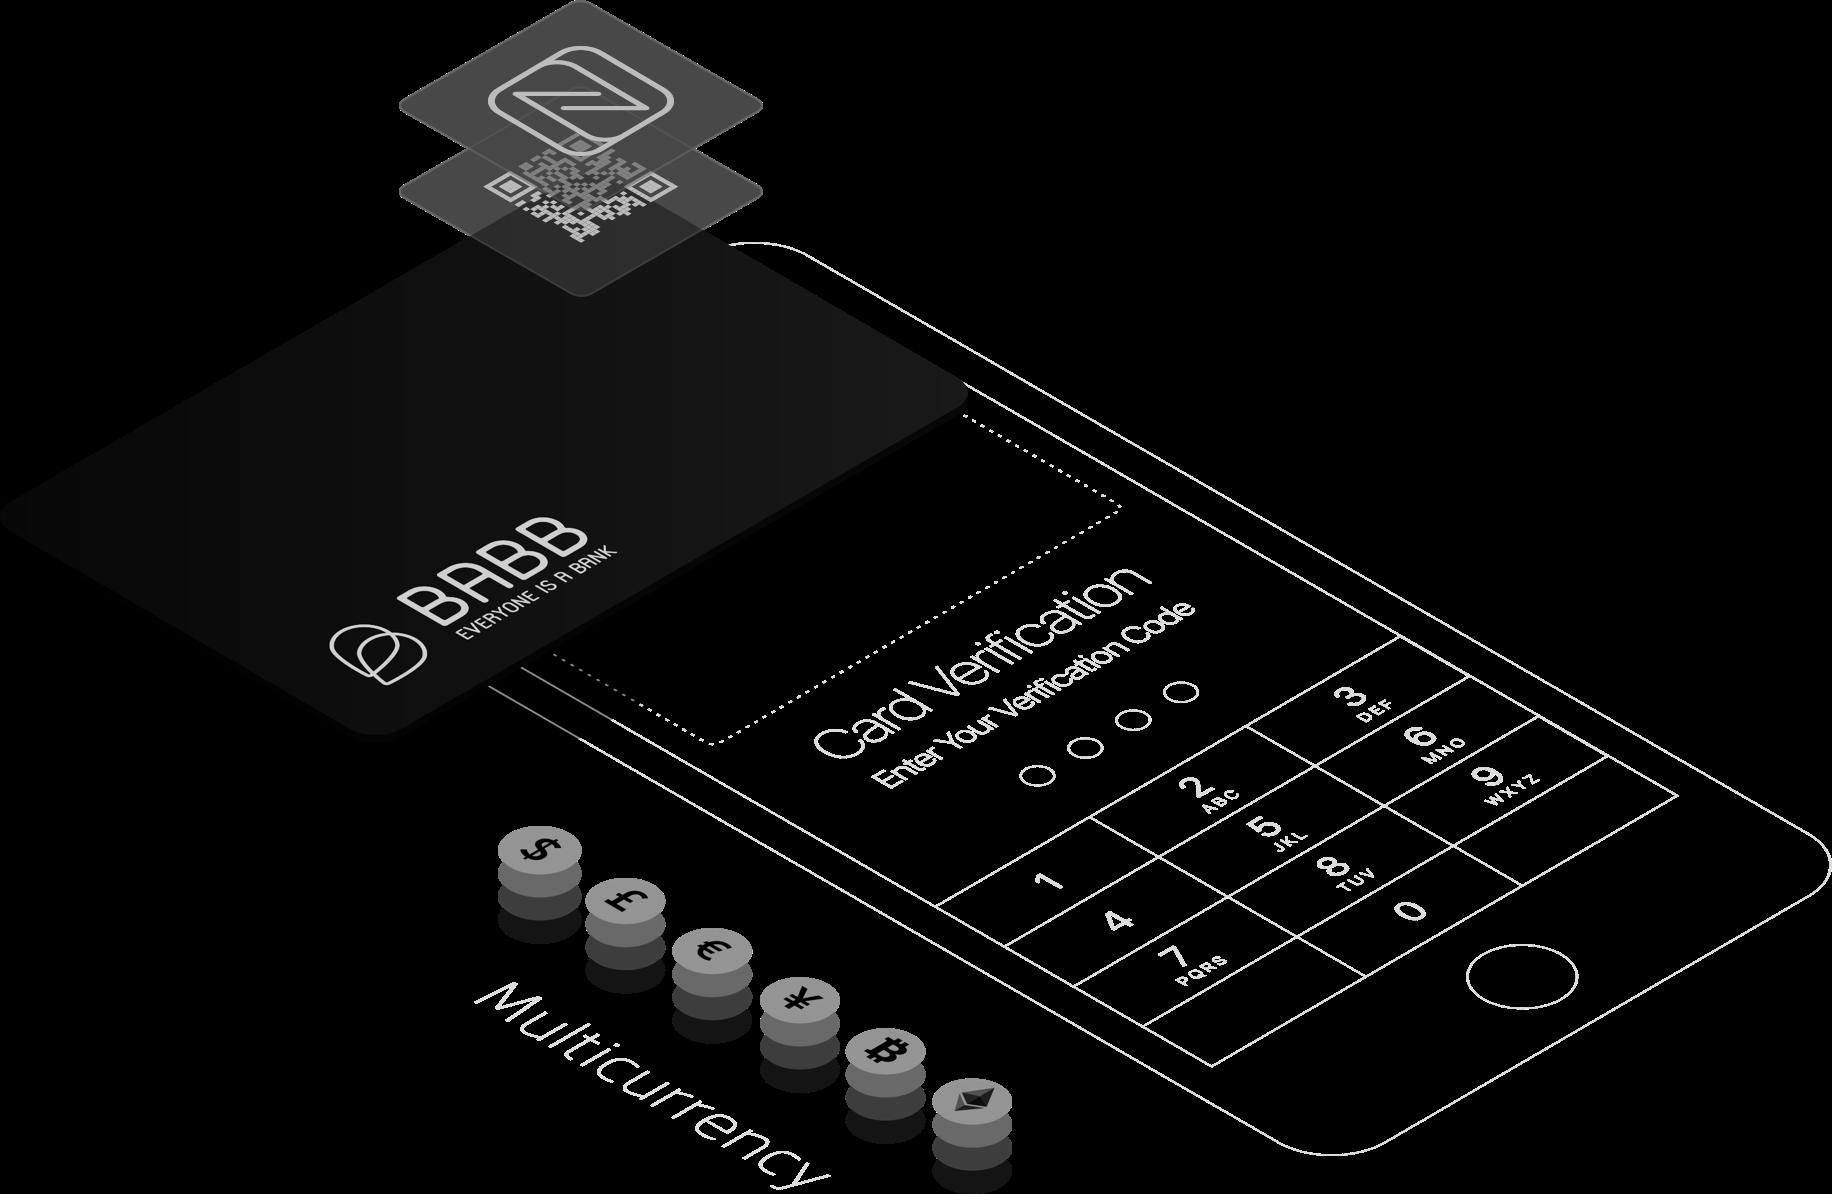 black-card@2x.eb4b77cb6ce800b2c715dd6293740b7e.png